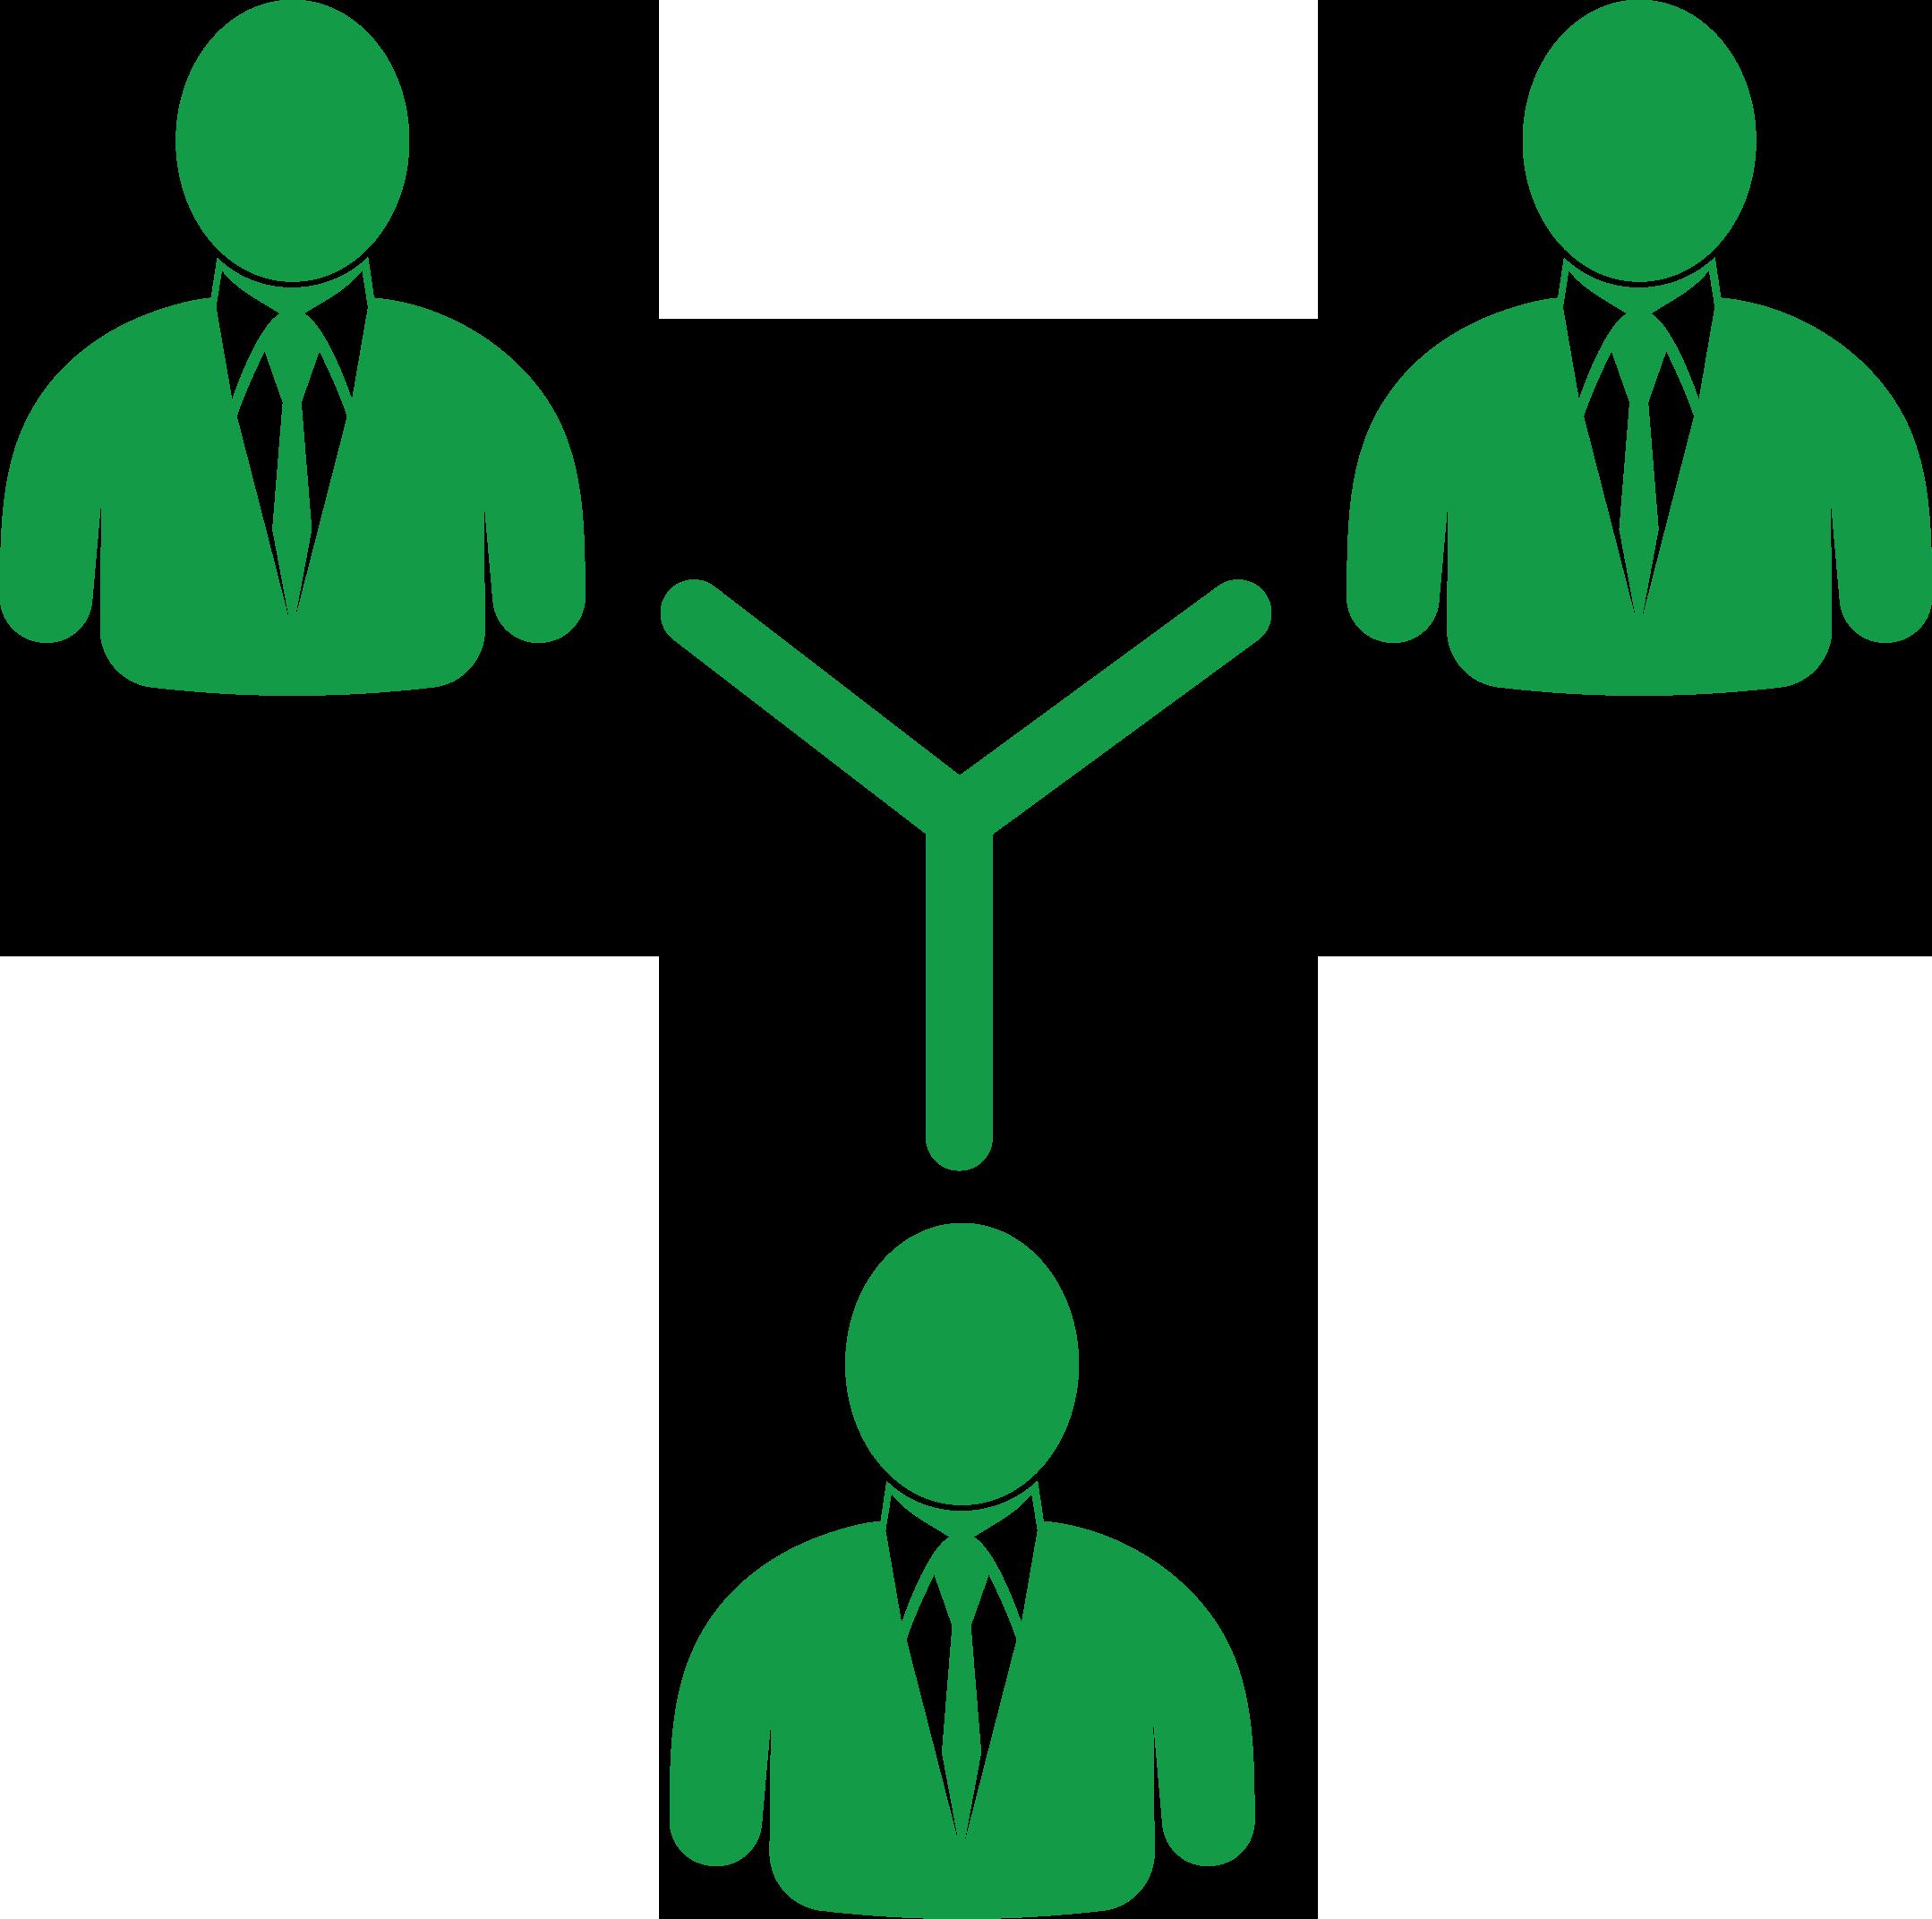 The Firm - Okoplan